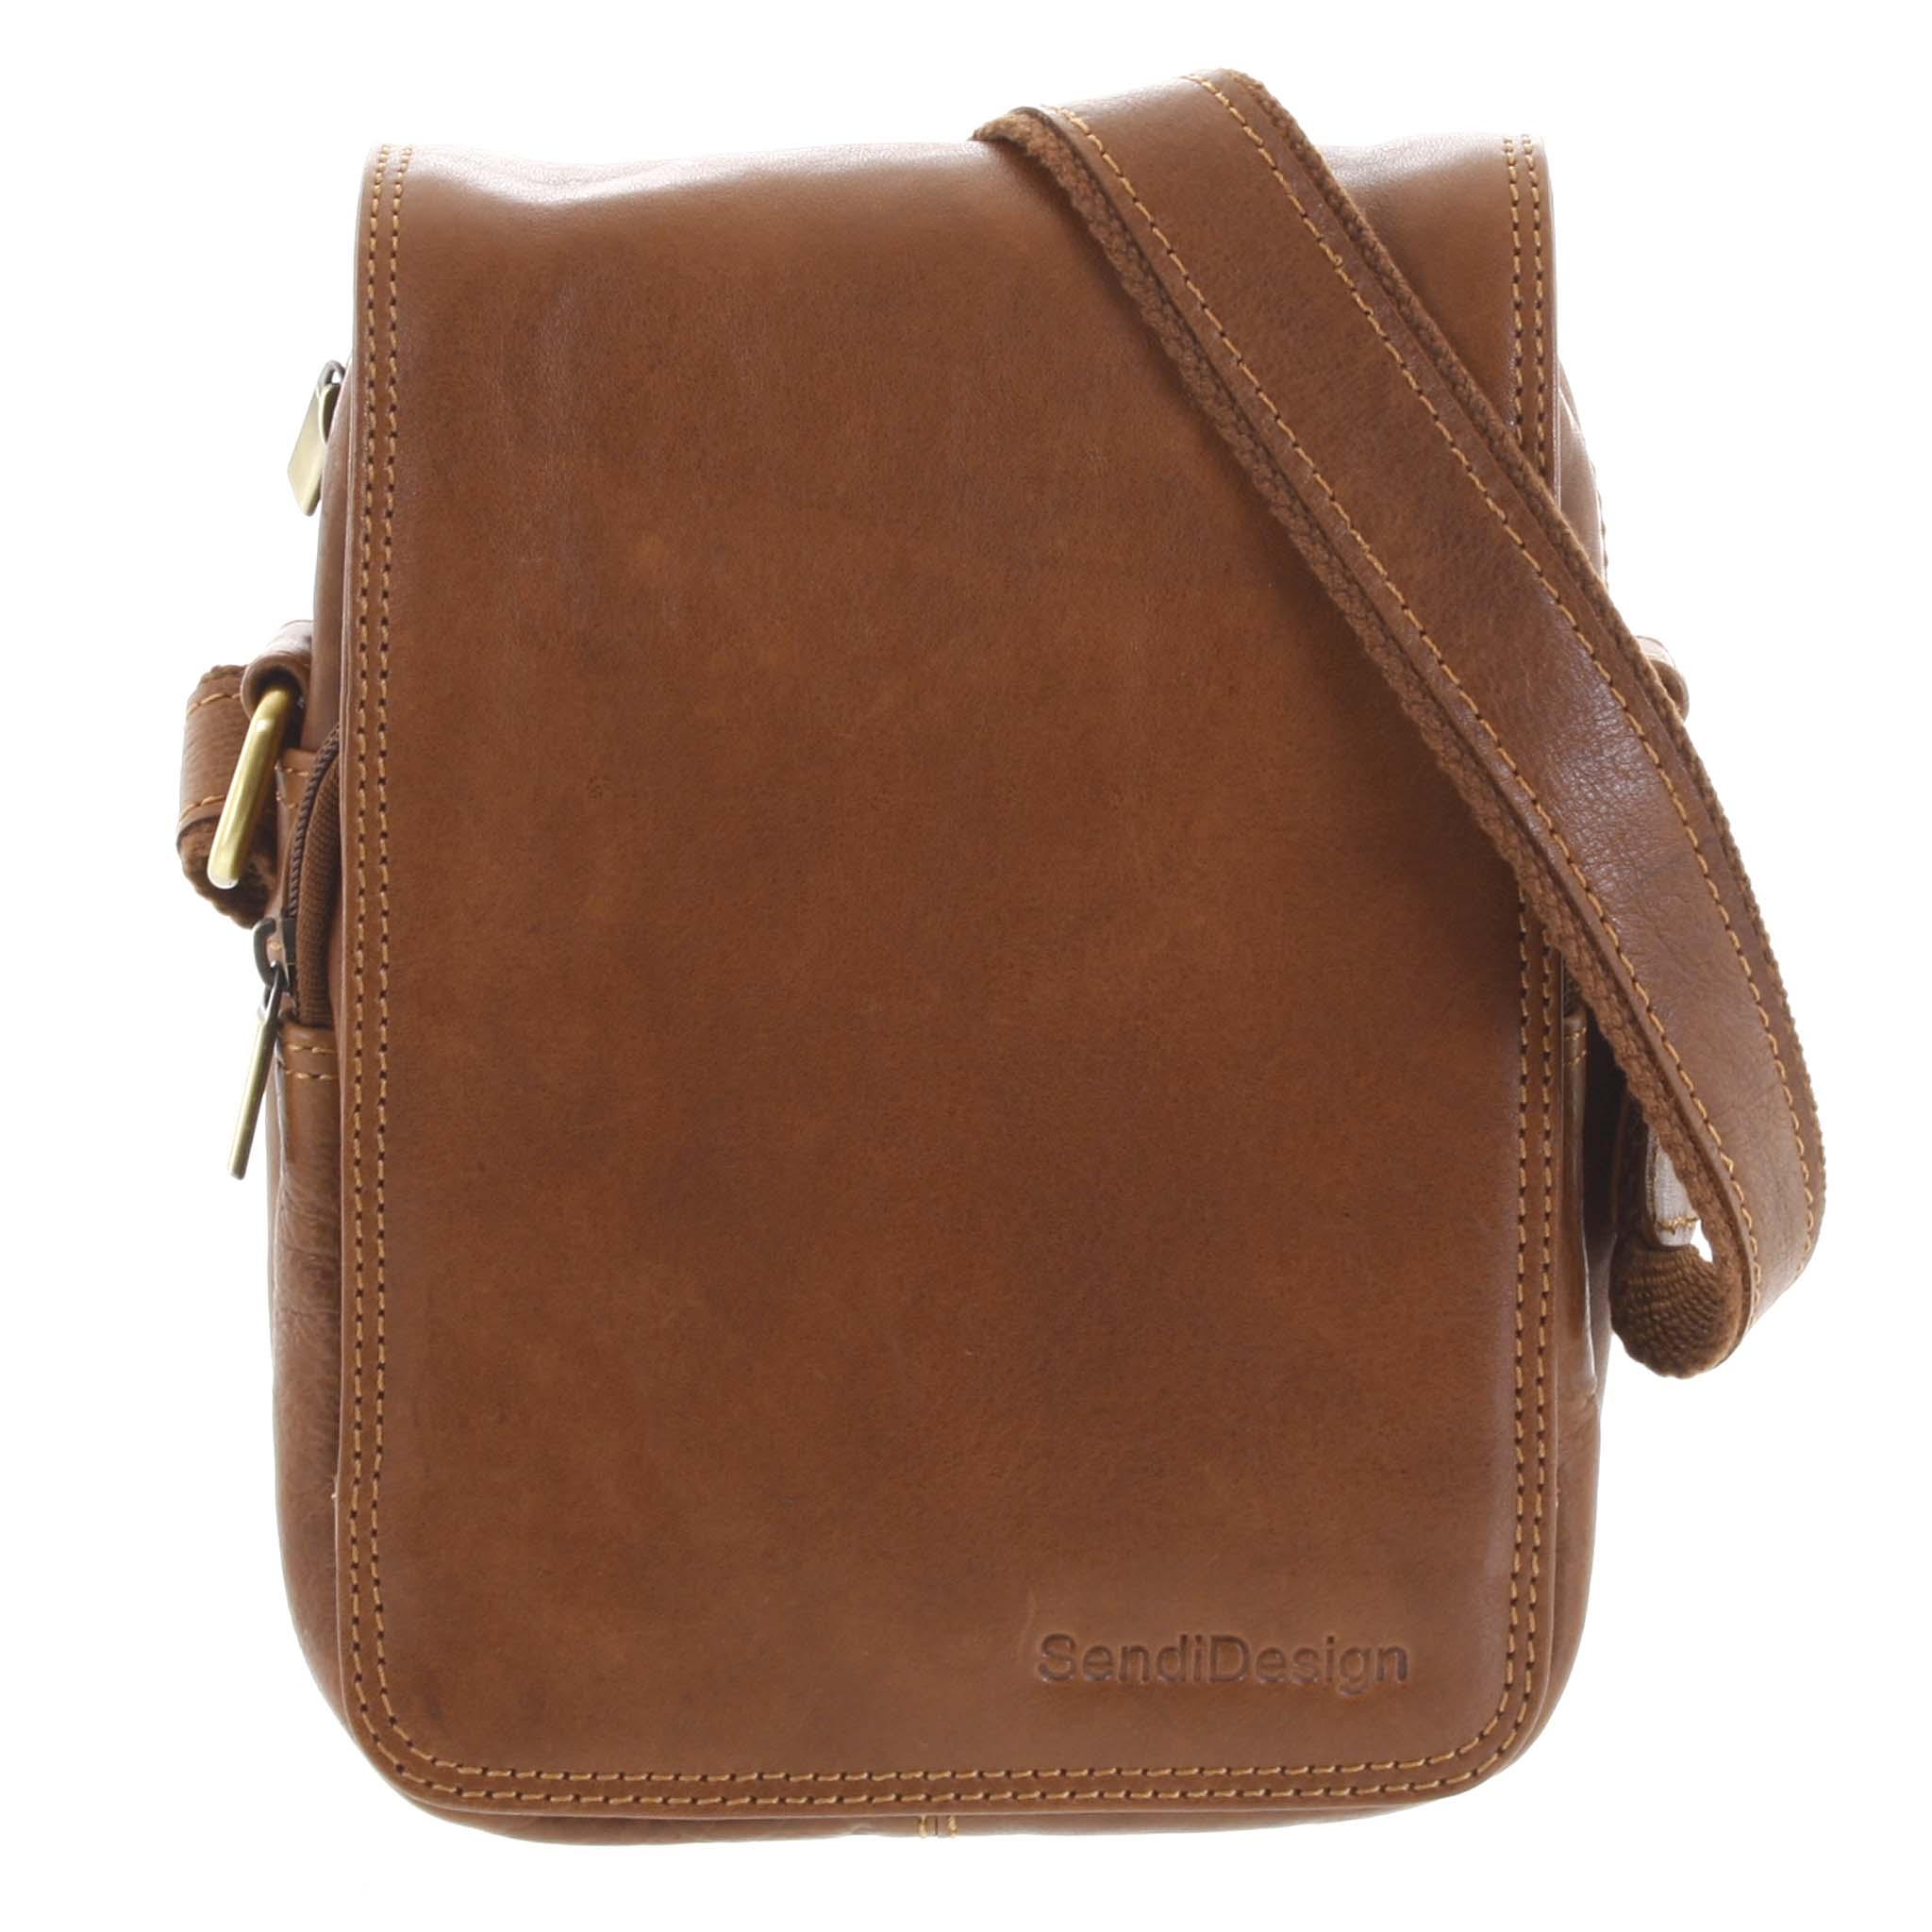 Pánská kožená taška přes rameno hnědá - SendiDesign Muxos